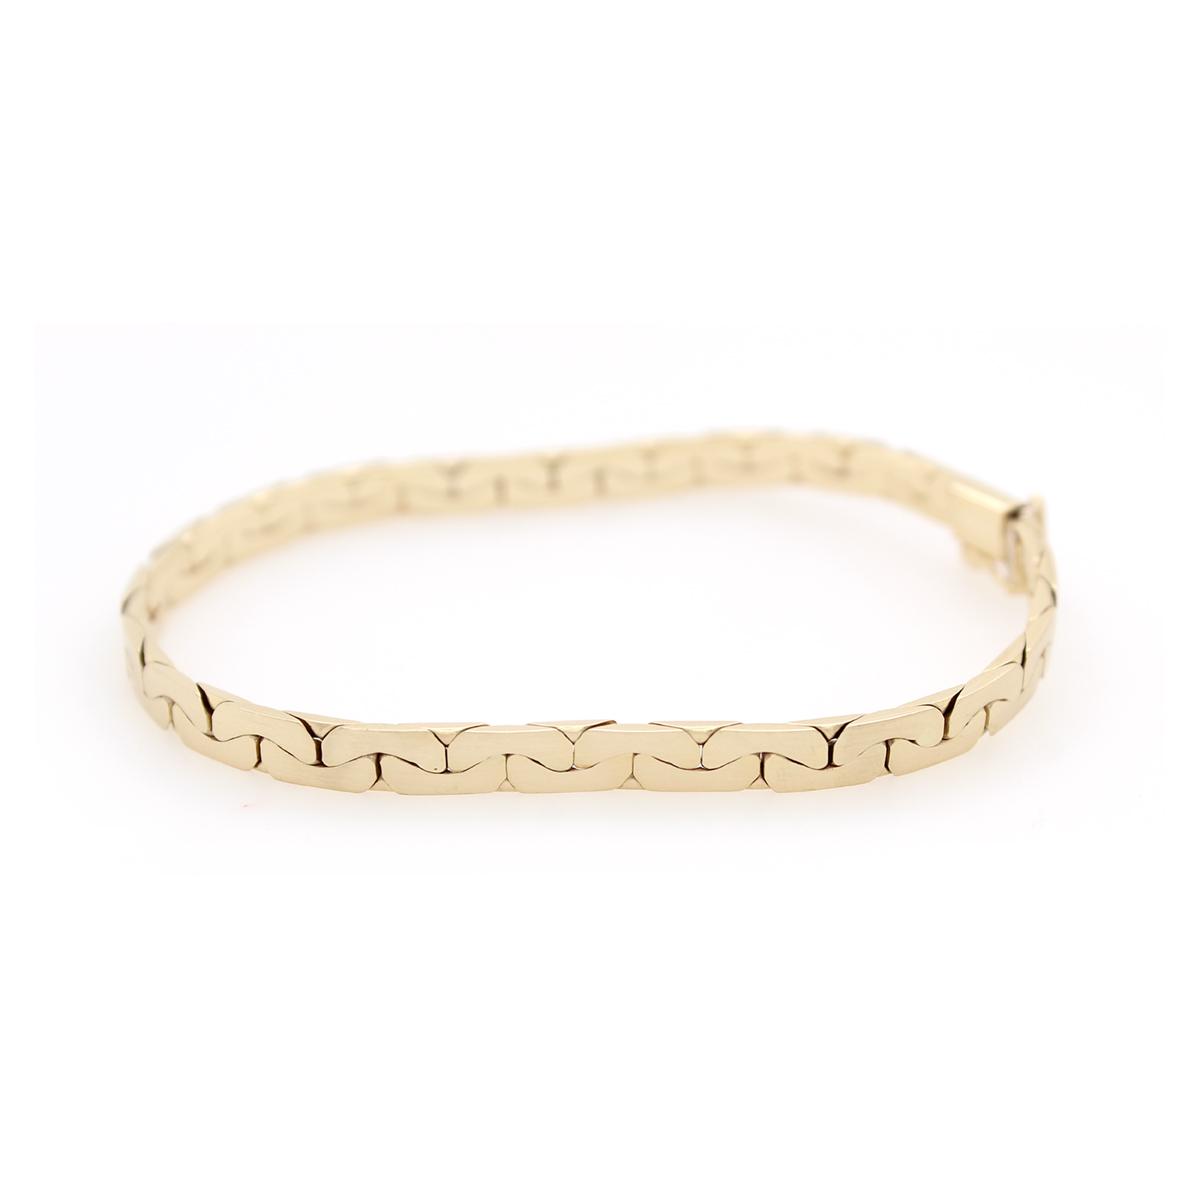 Vintage 14 Karat Yellow Gold Modified Cobra Link Bracelet